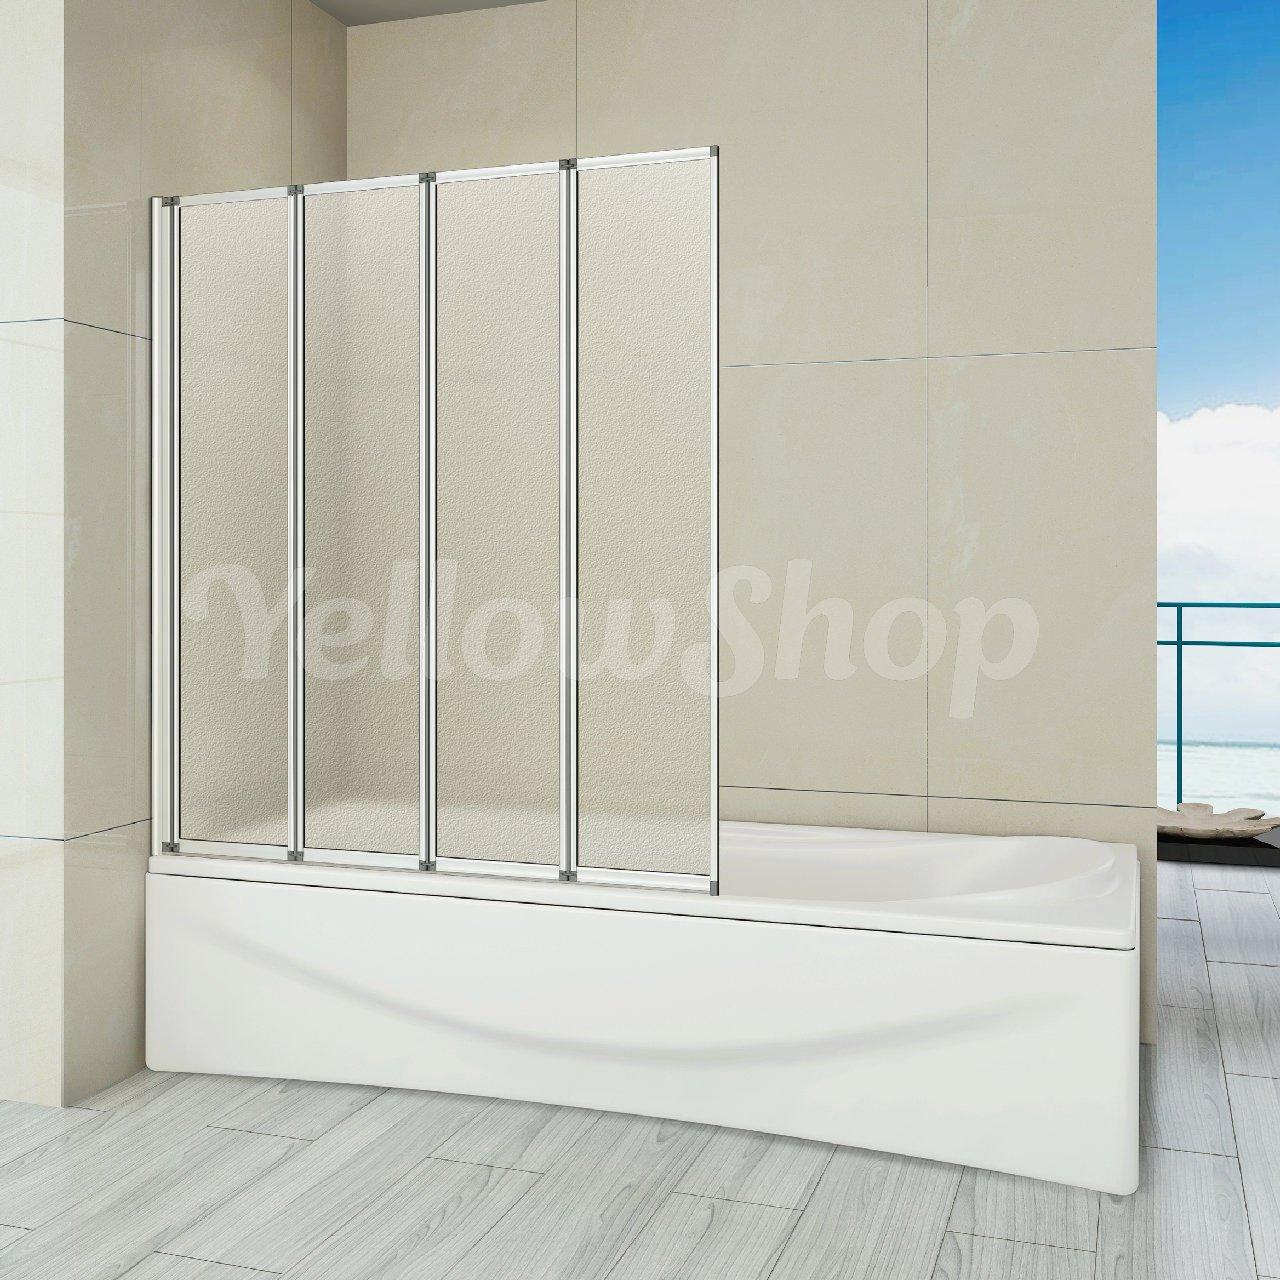 Yellowshop - Mampara de baño plegable, de aluminio y cristal ...